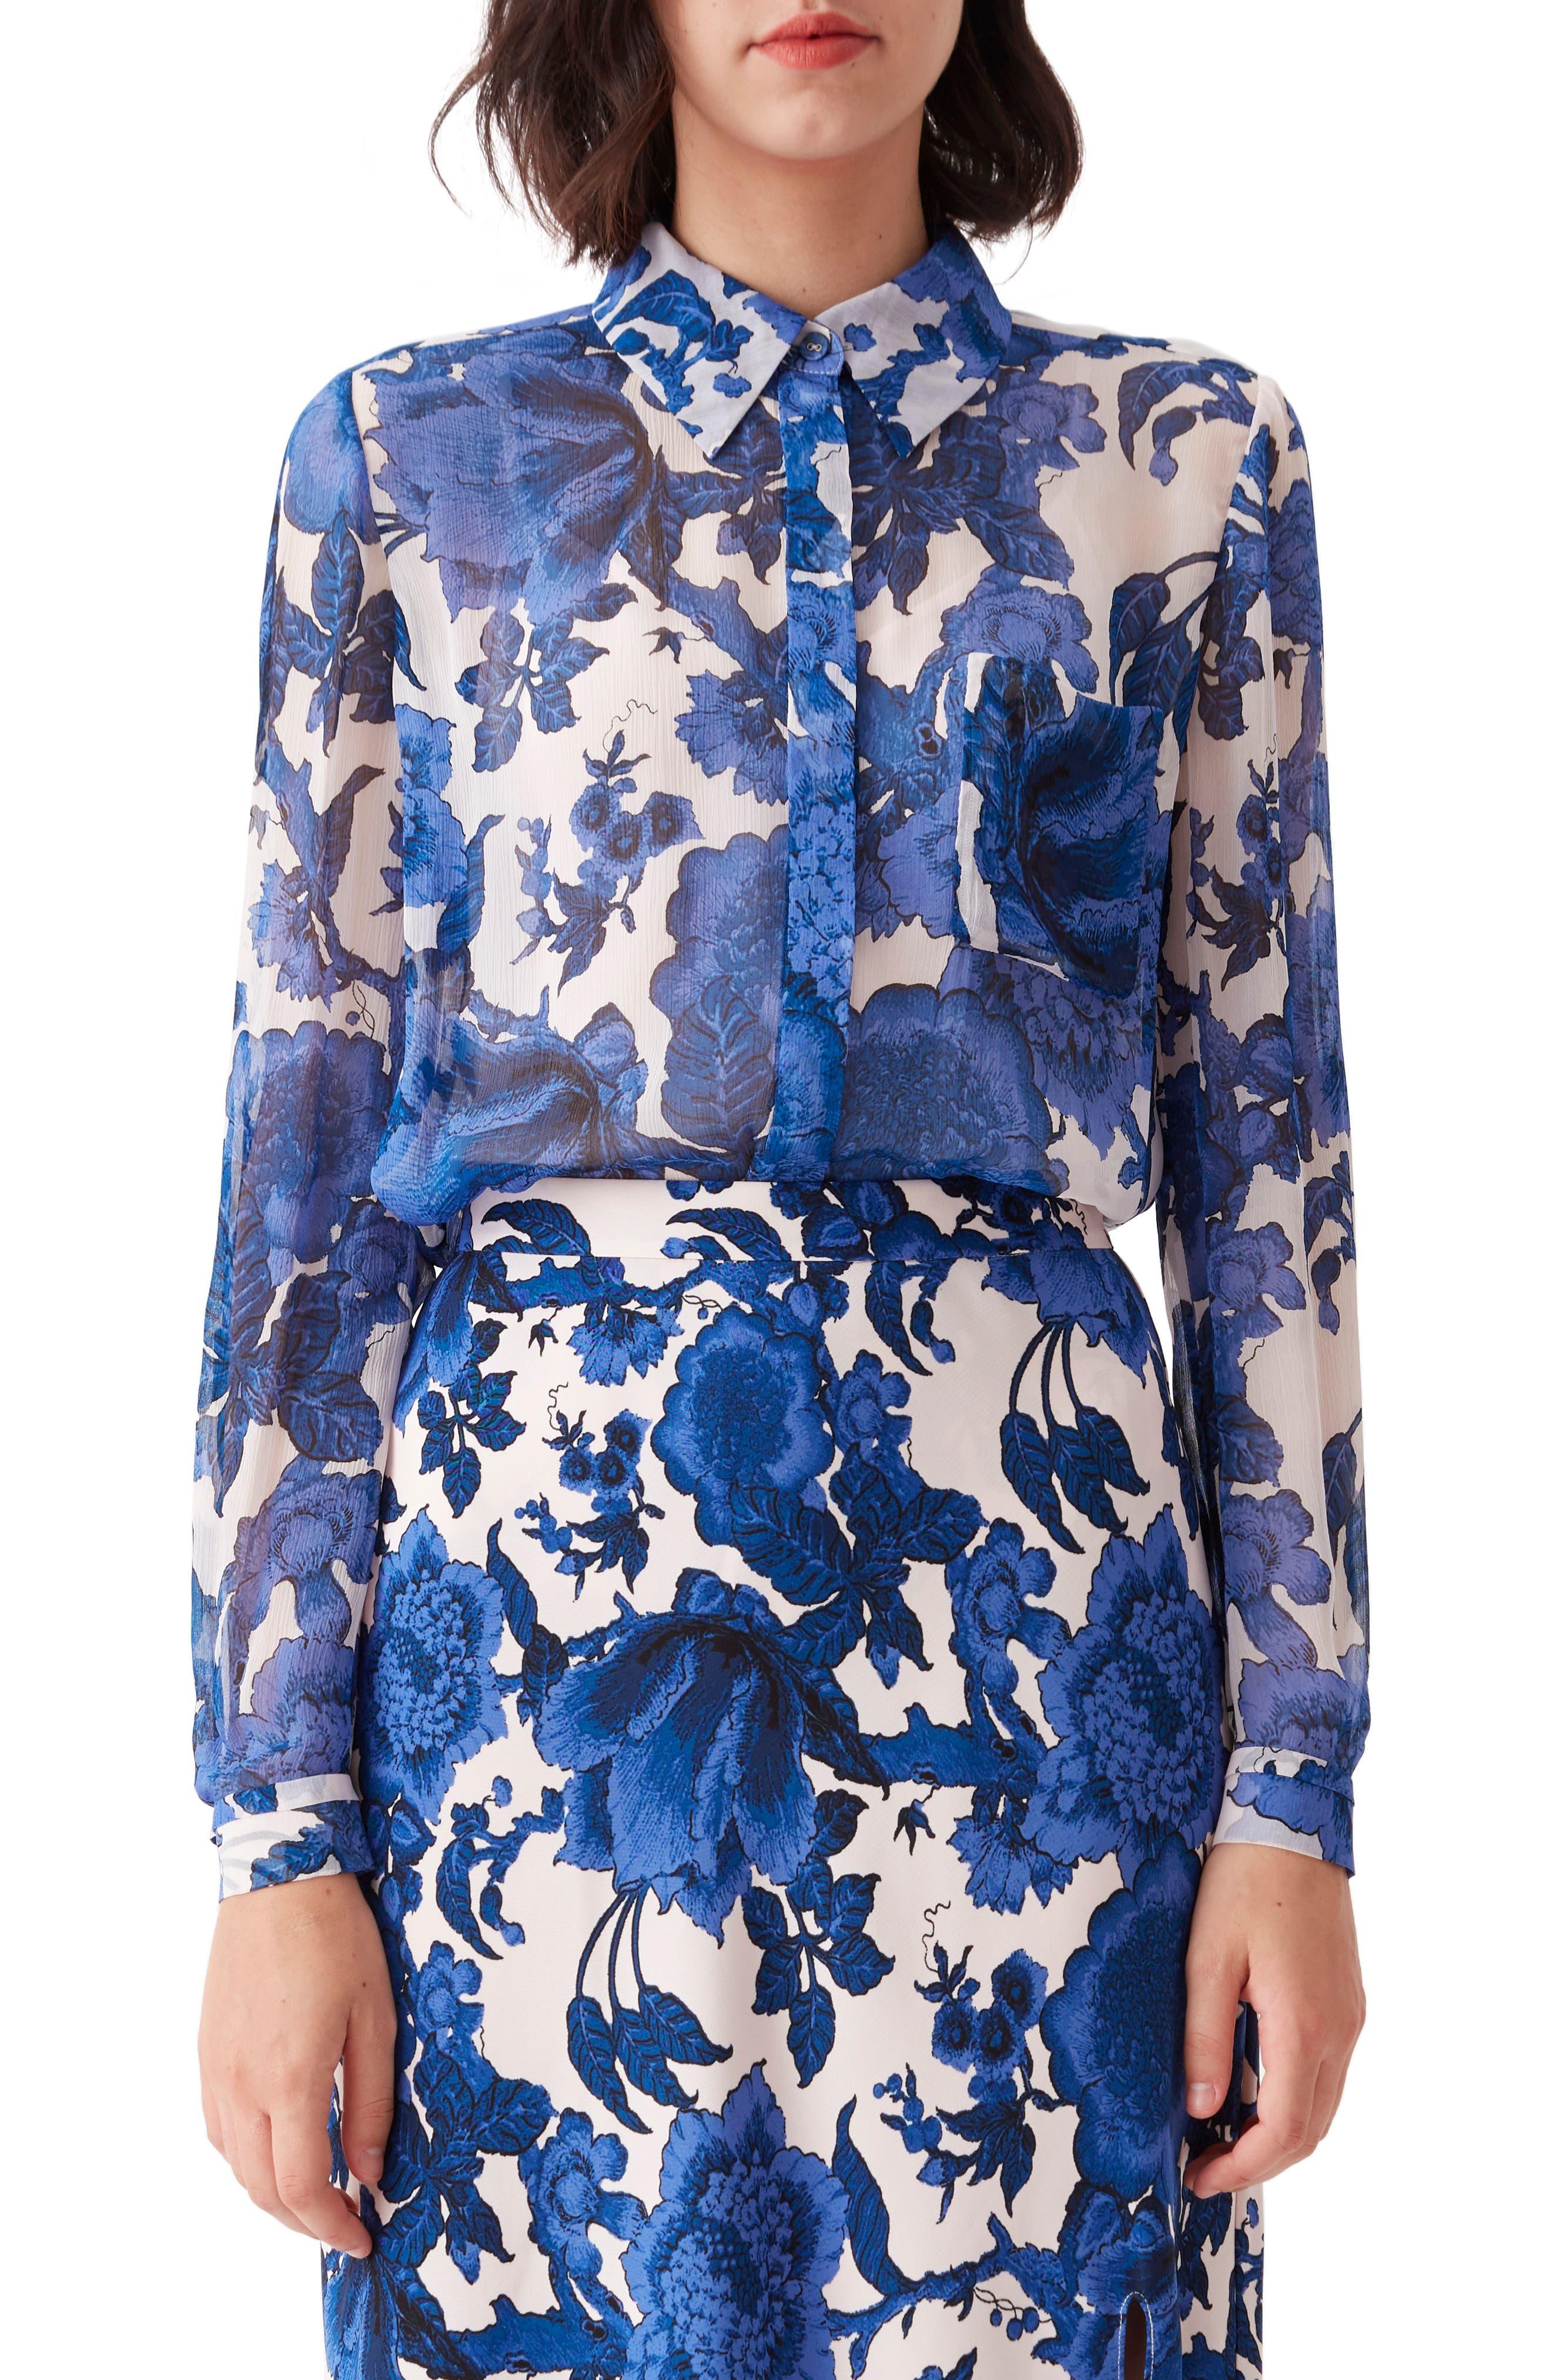 Lorelai Floral Button-Up Shirt